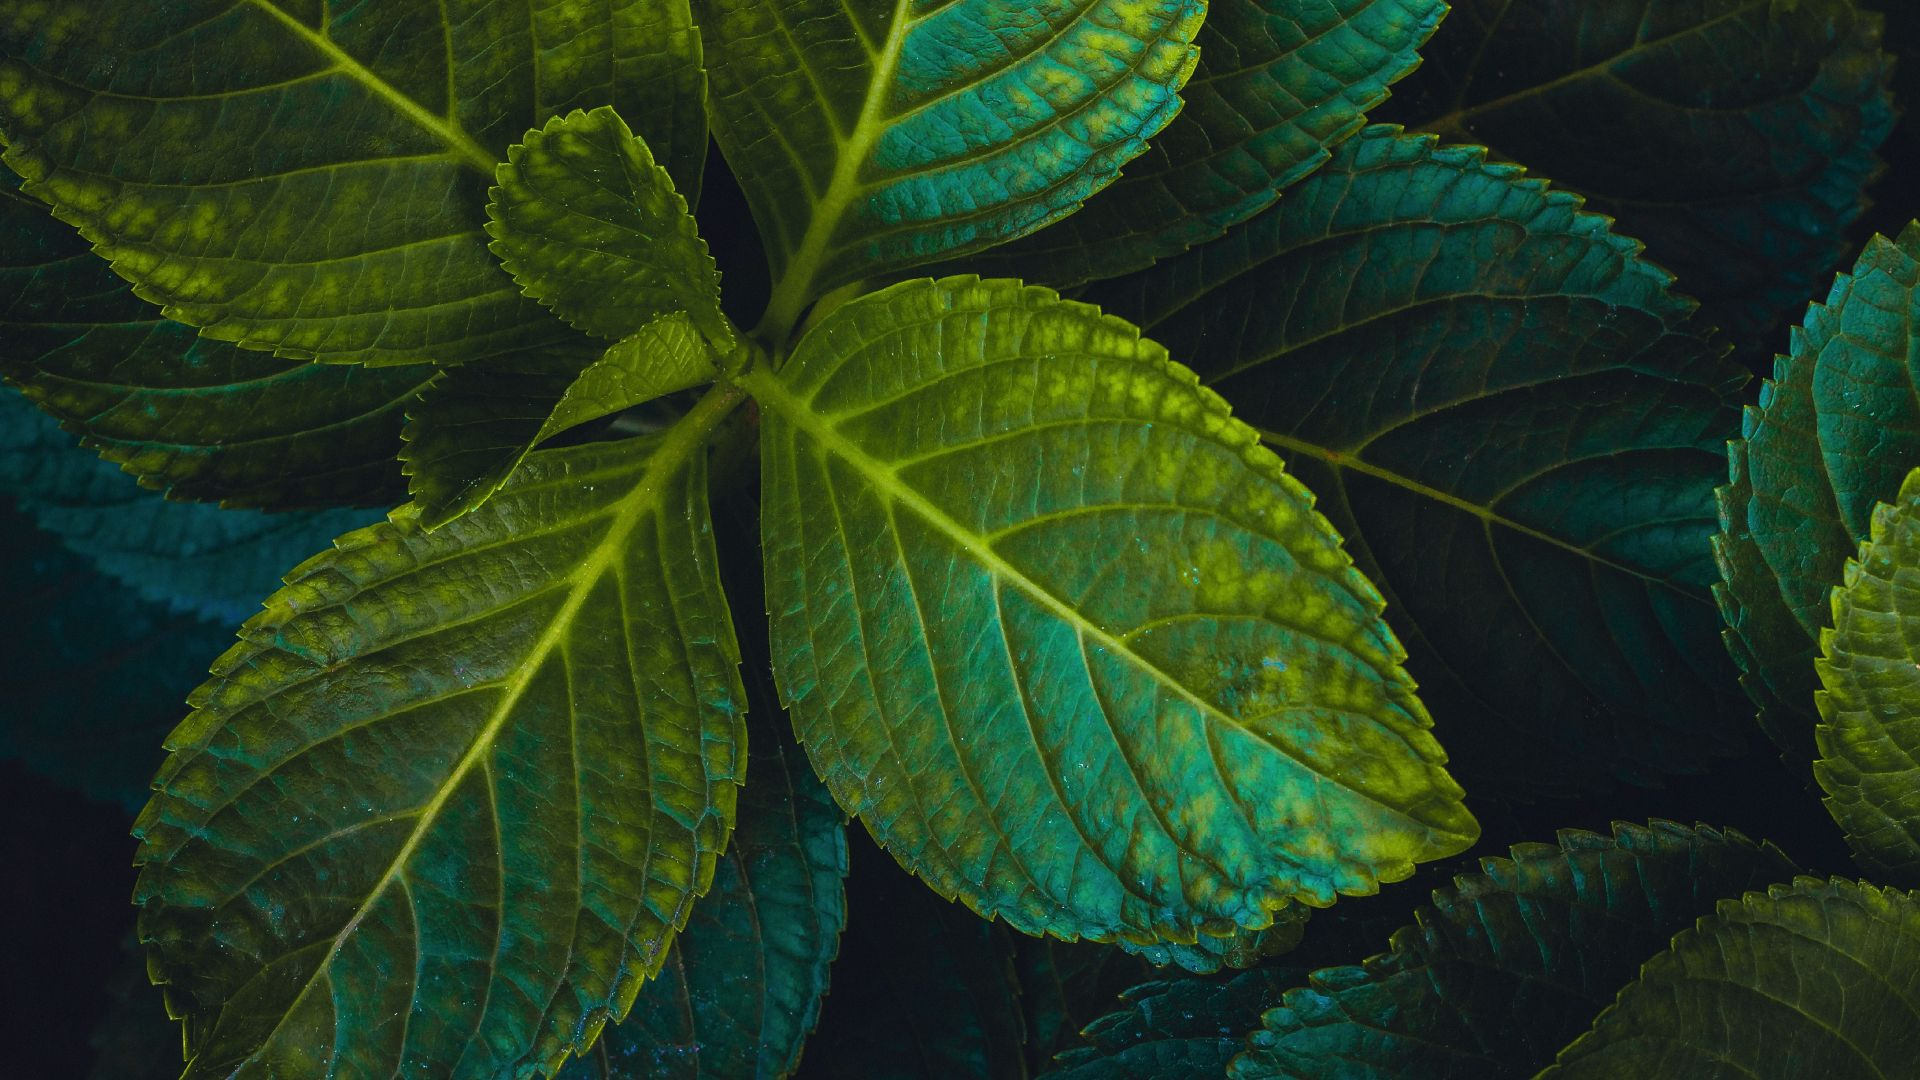 Desktop Wallpaper Green Leaves Close Up 4k Hd Image